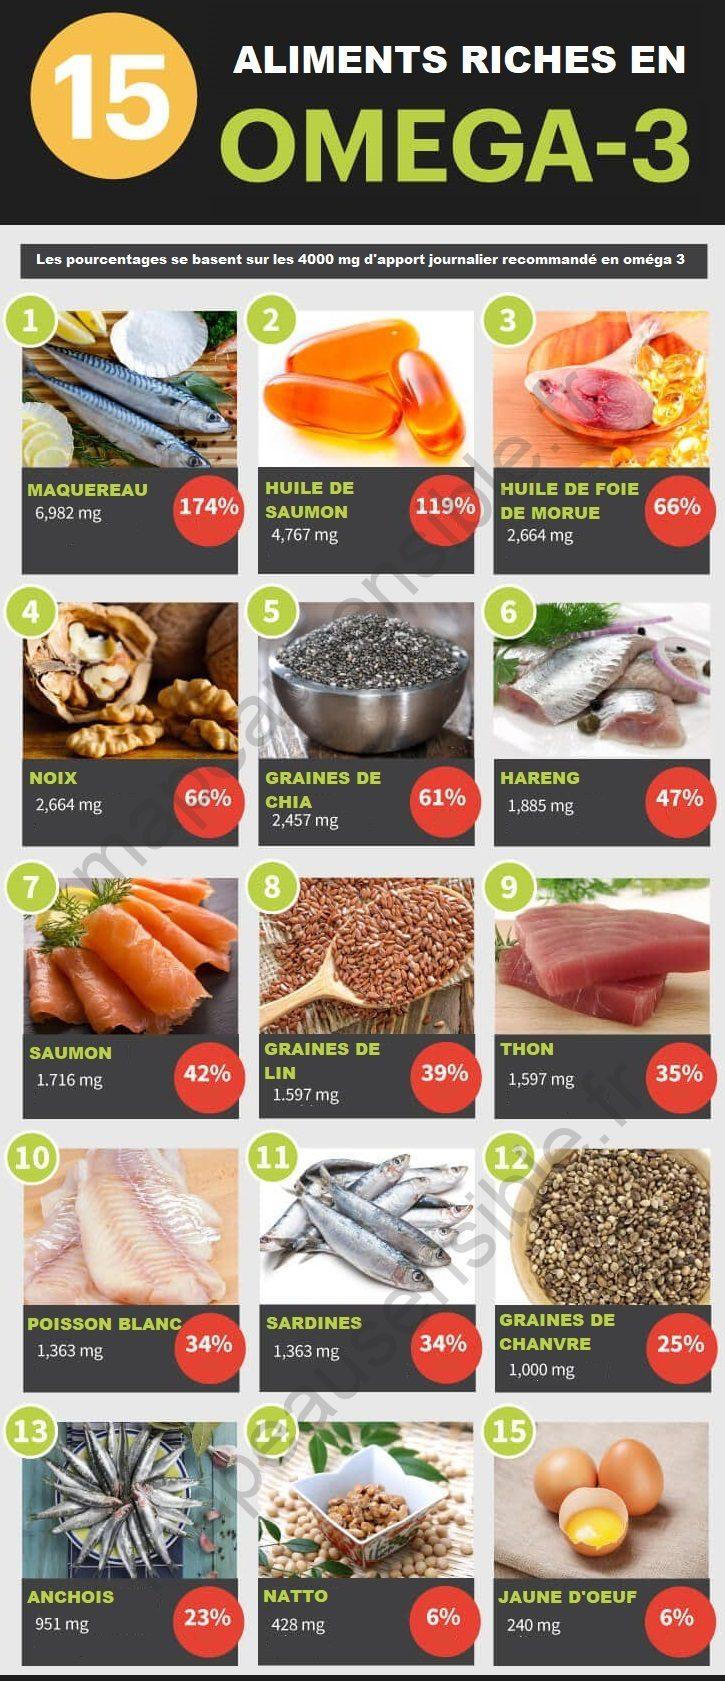 aliments-riches-en-omega-3